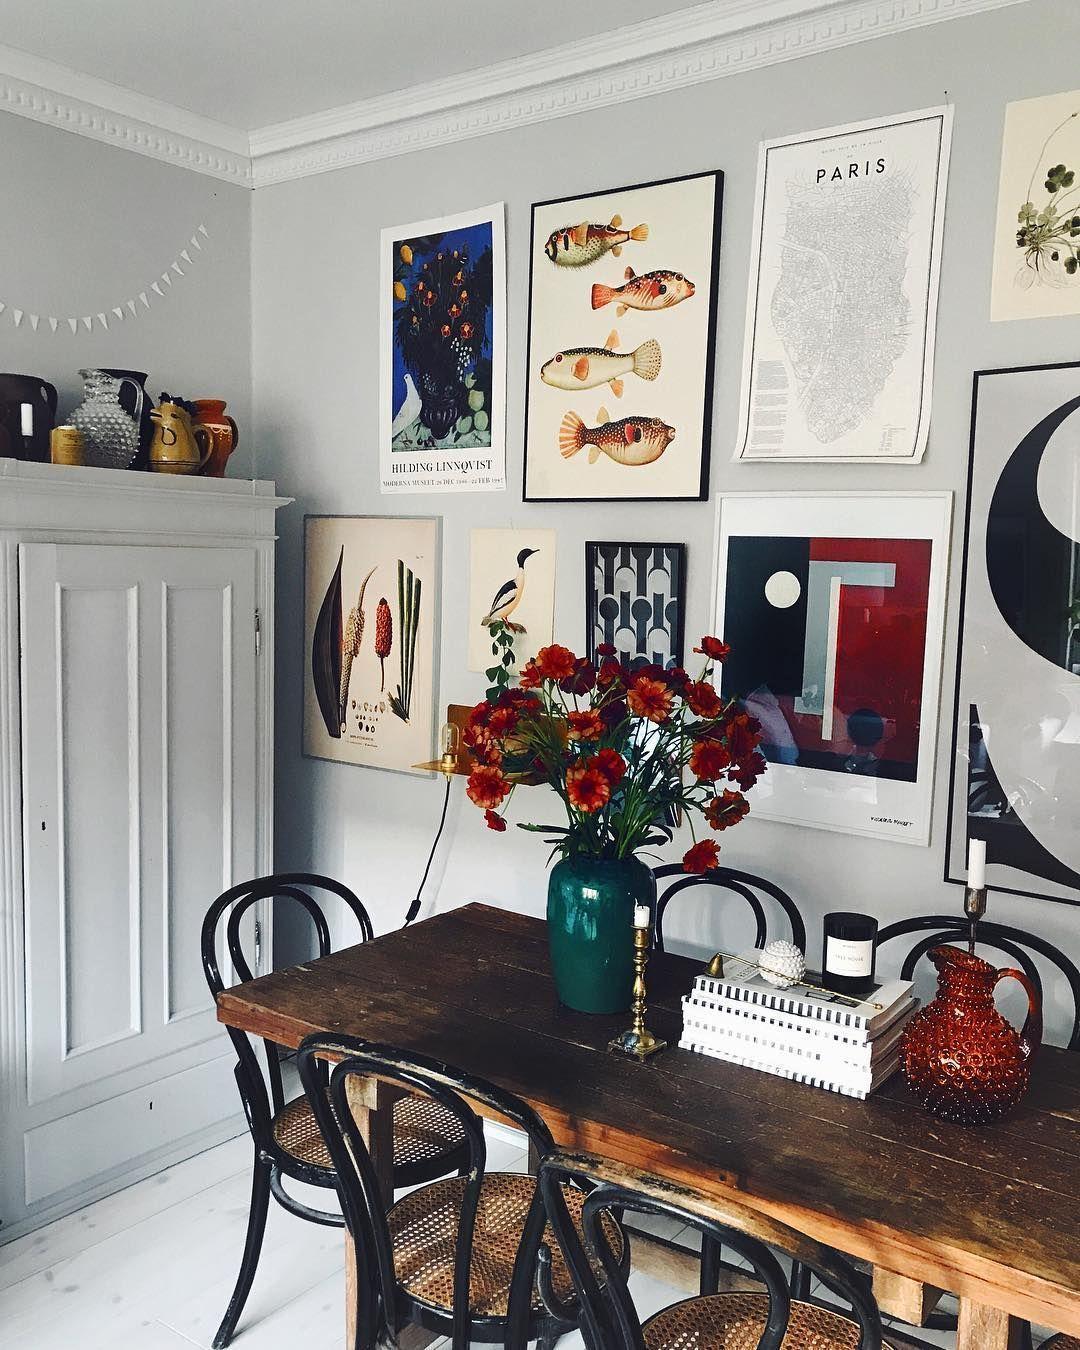 Best Of The Dining Room Lighting Ideas Jessedaro Wall Decor Walls